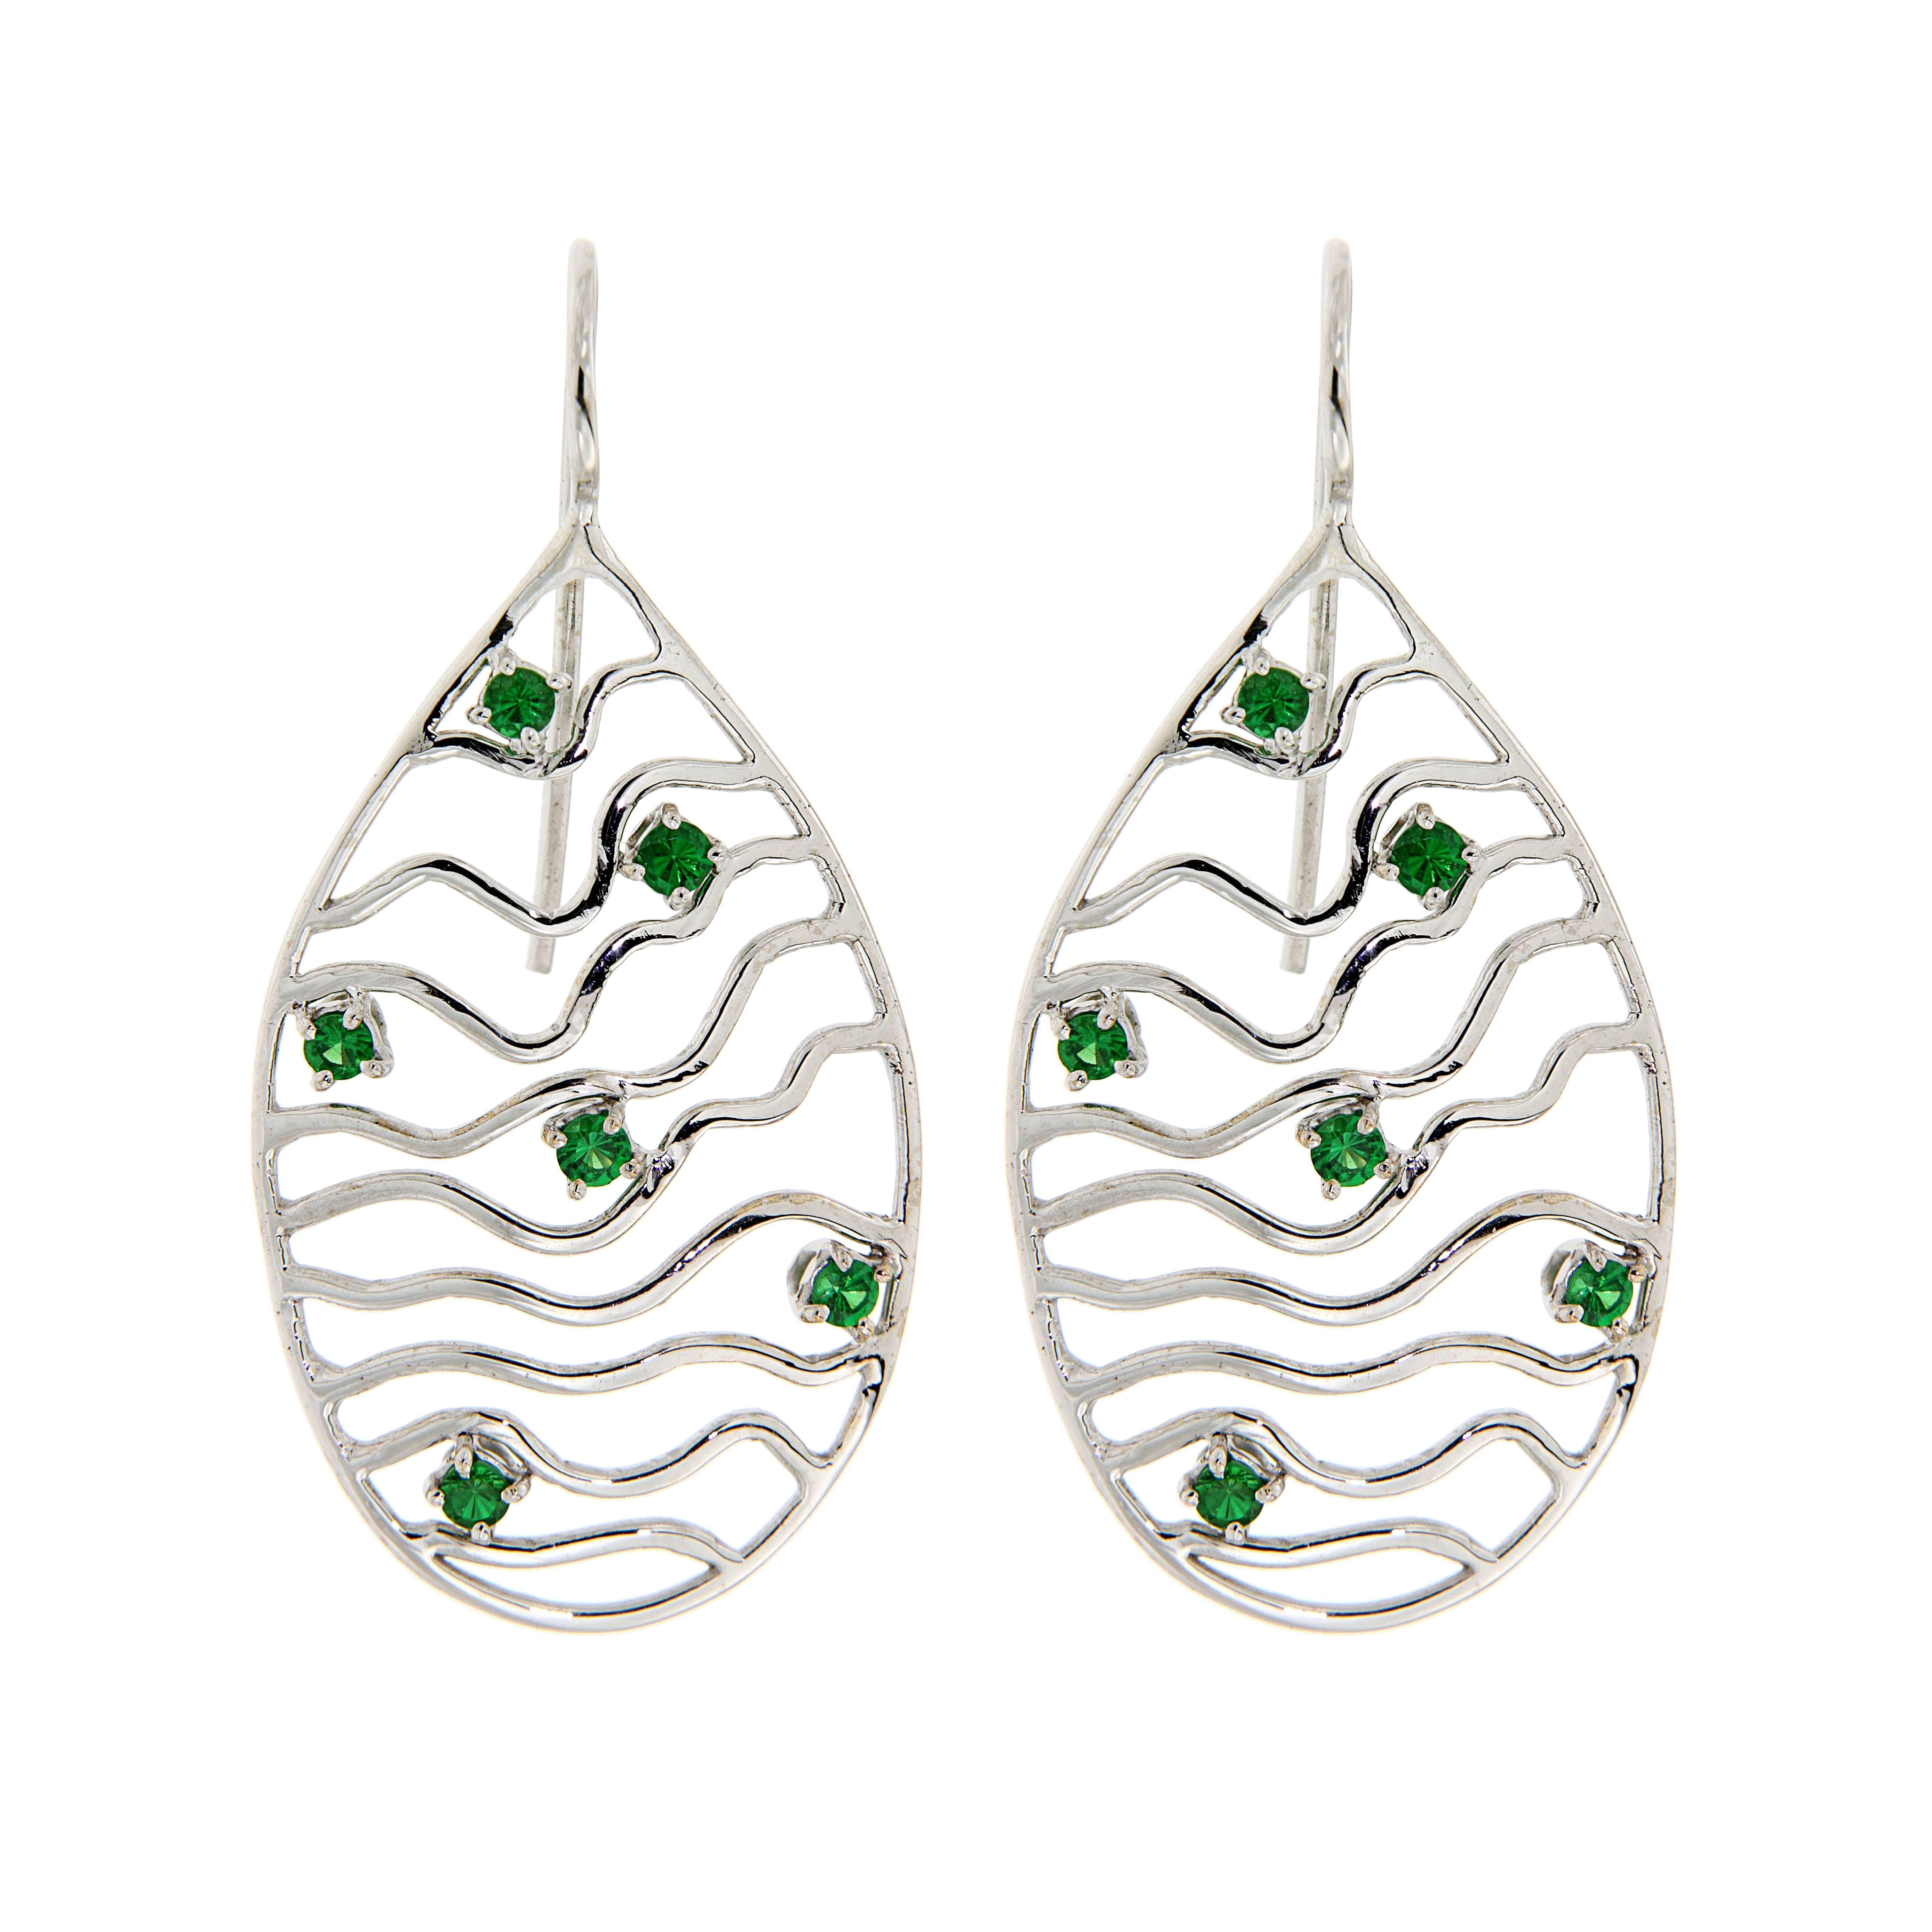 Tsavorite White Gold 18K Drop Earrings Handcrafted in Italy by Botta Gioielli